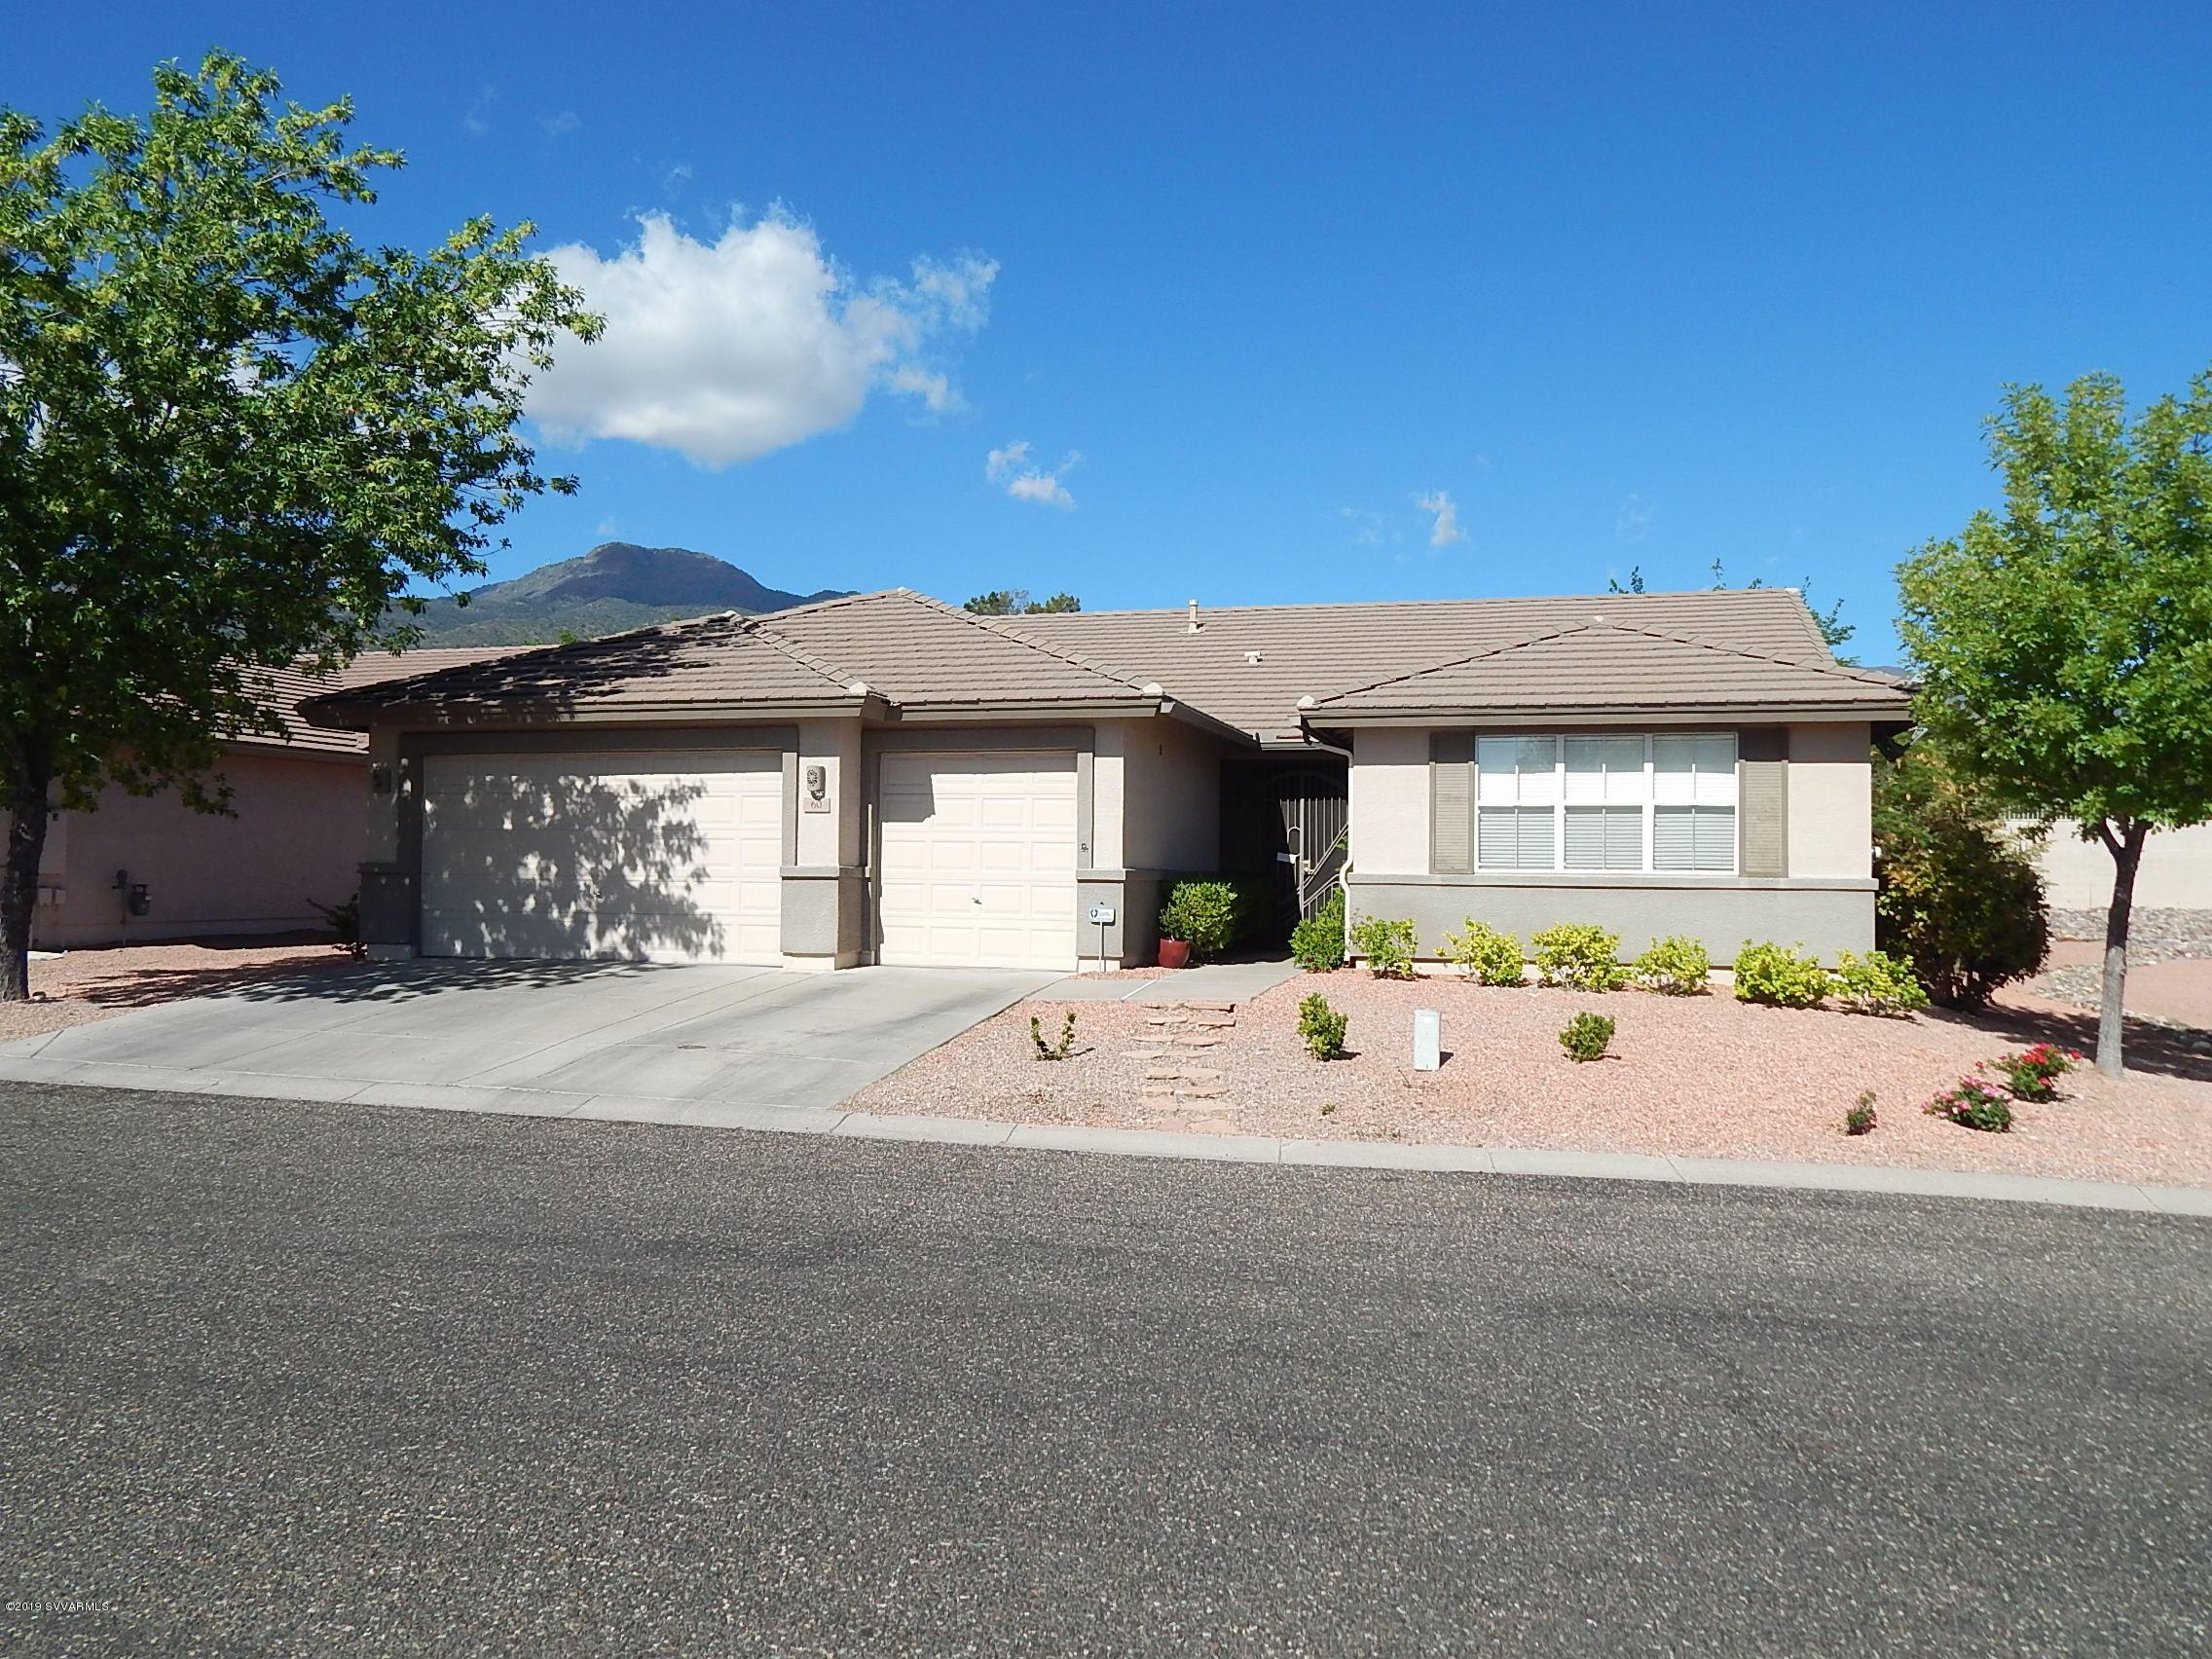 60 S Desperado Drive Cottonwood, AZ 86326